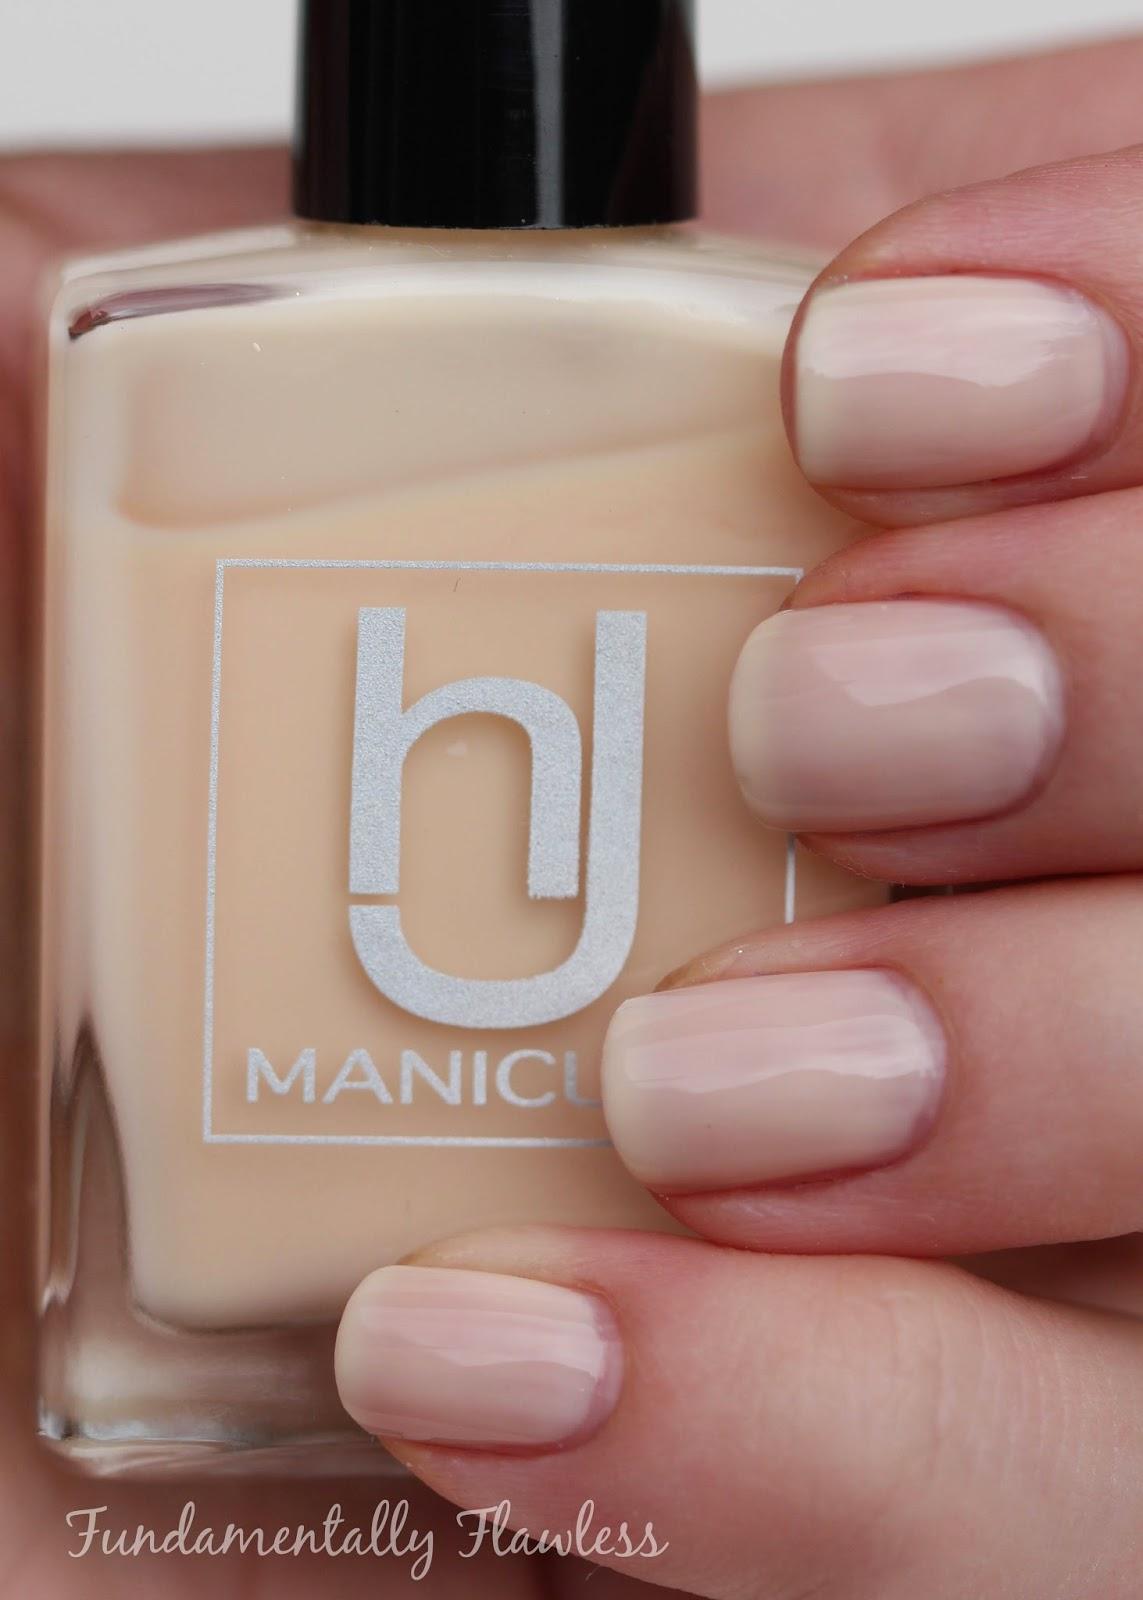 HJ Manicure Lace swatch